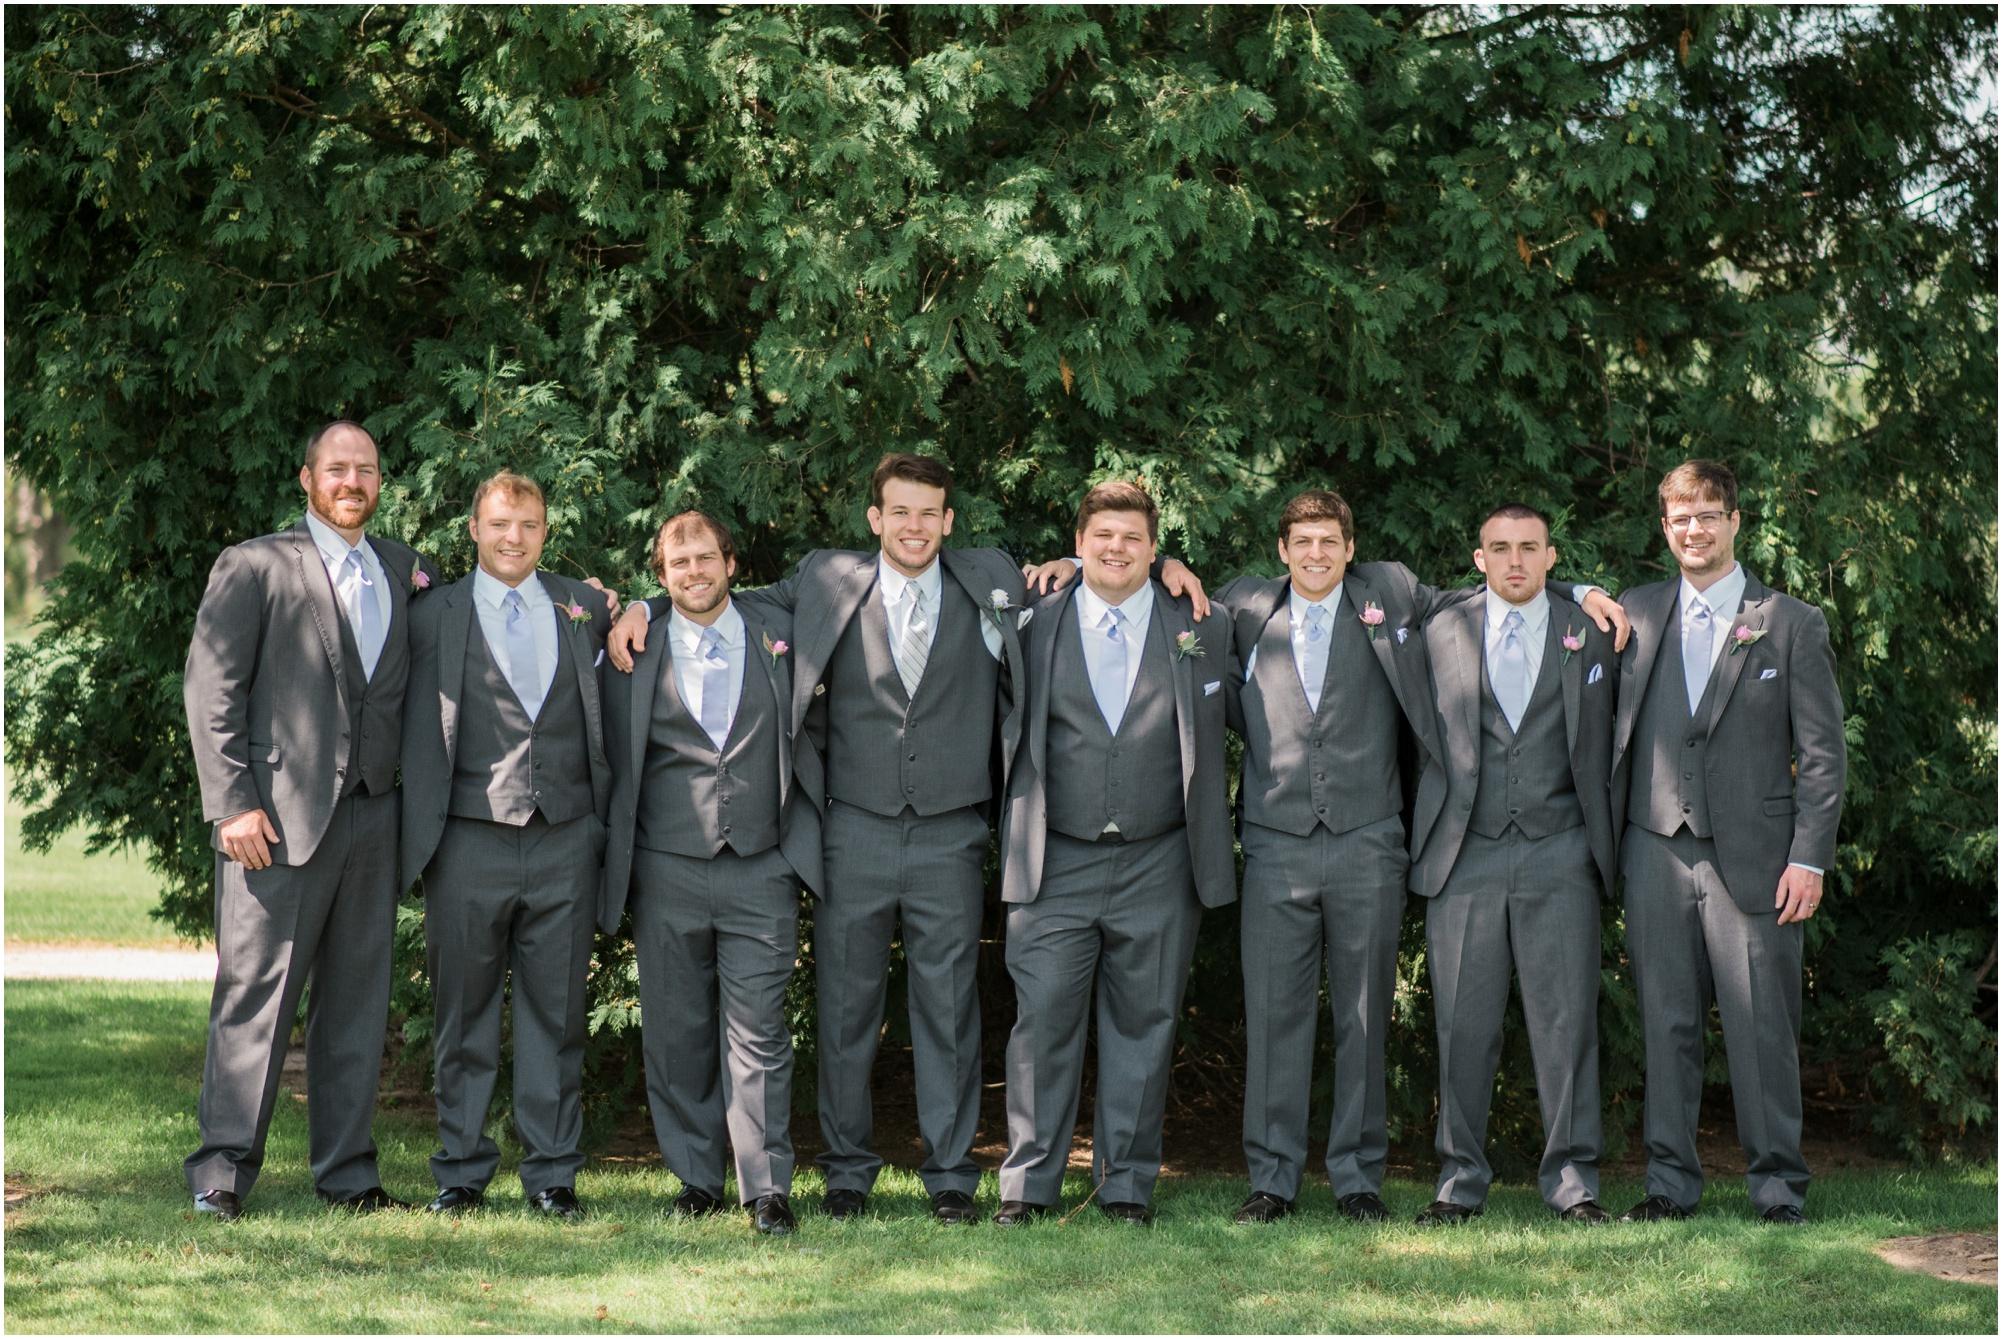 Wisconsin-Wedding-Photographer-Reedsburg-Country-Club-Kaela-and Matt-Wedding-190.jpg